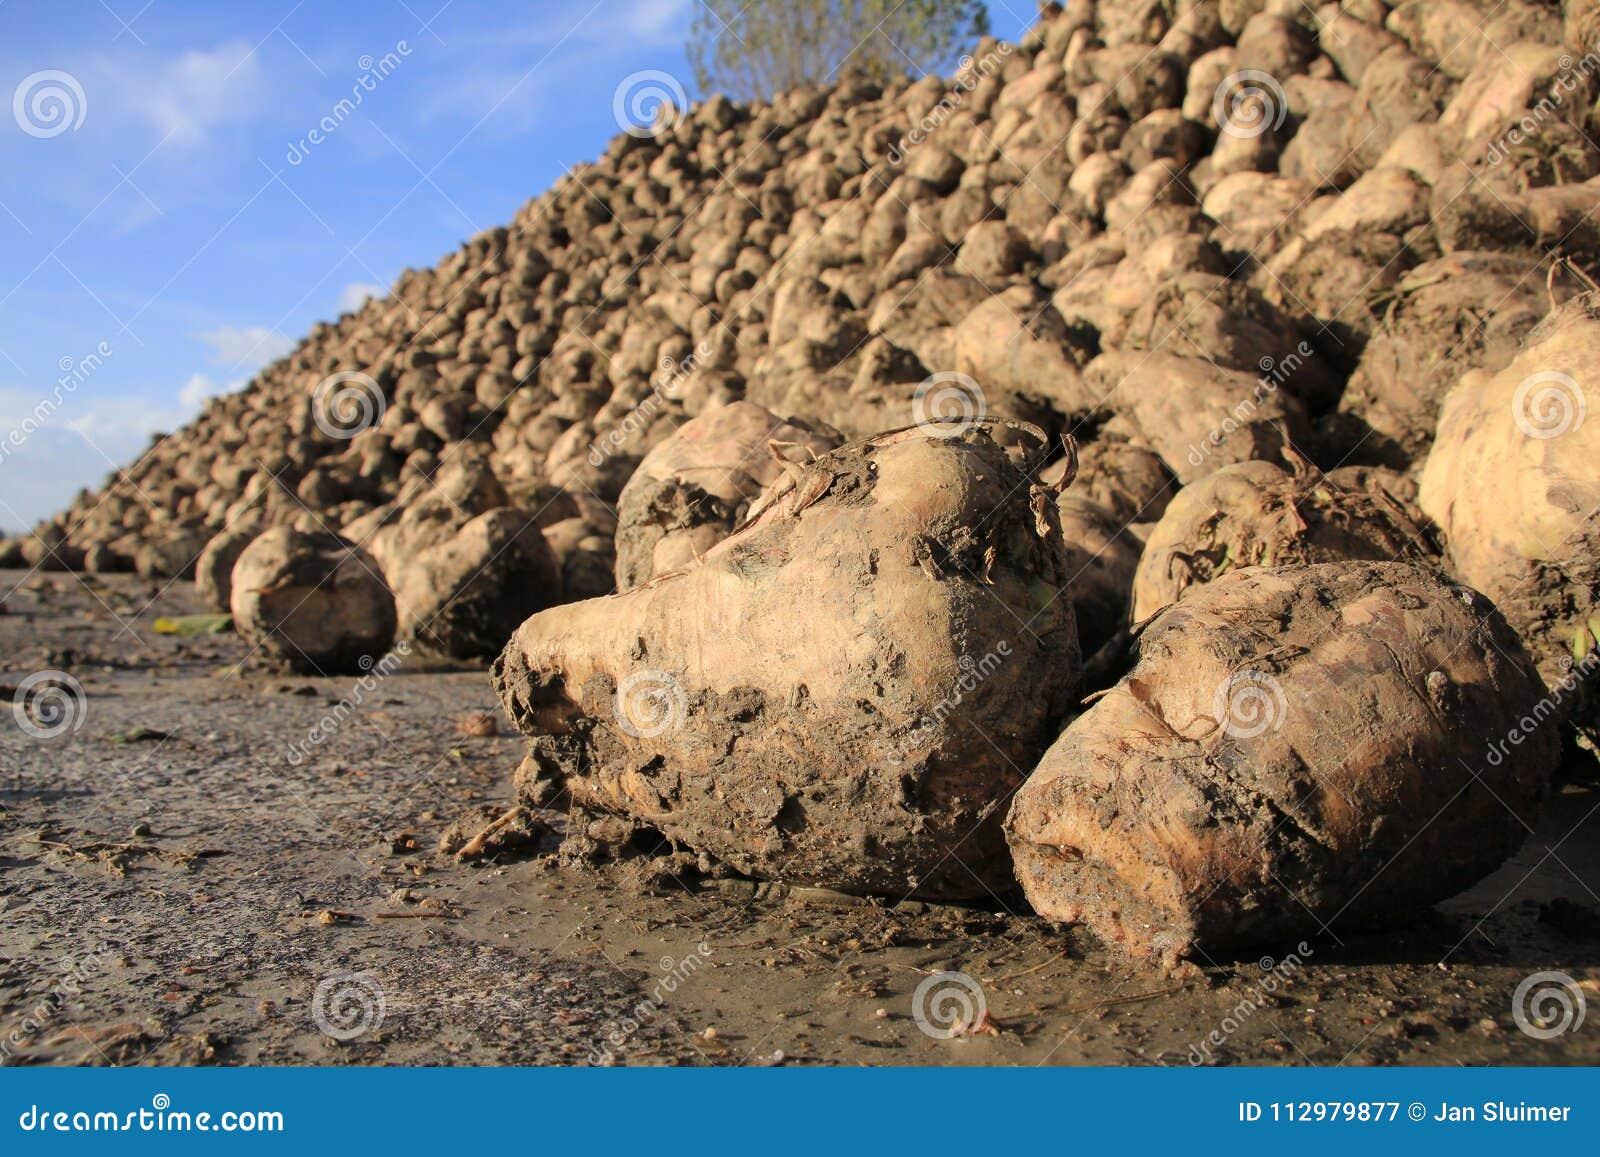 Many sugar beets on a heap.